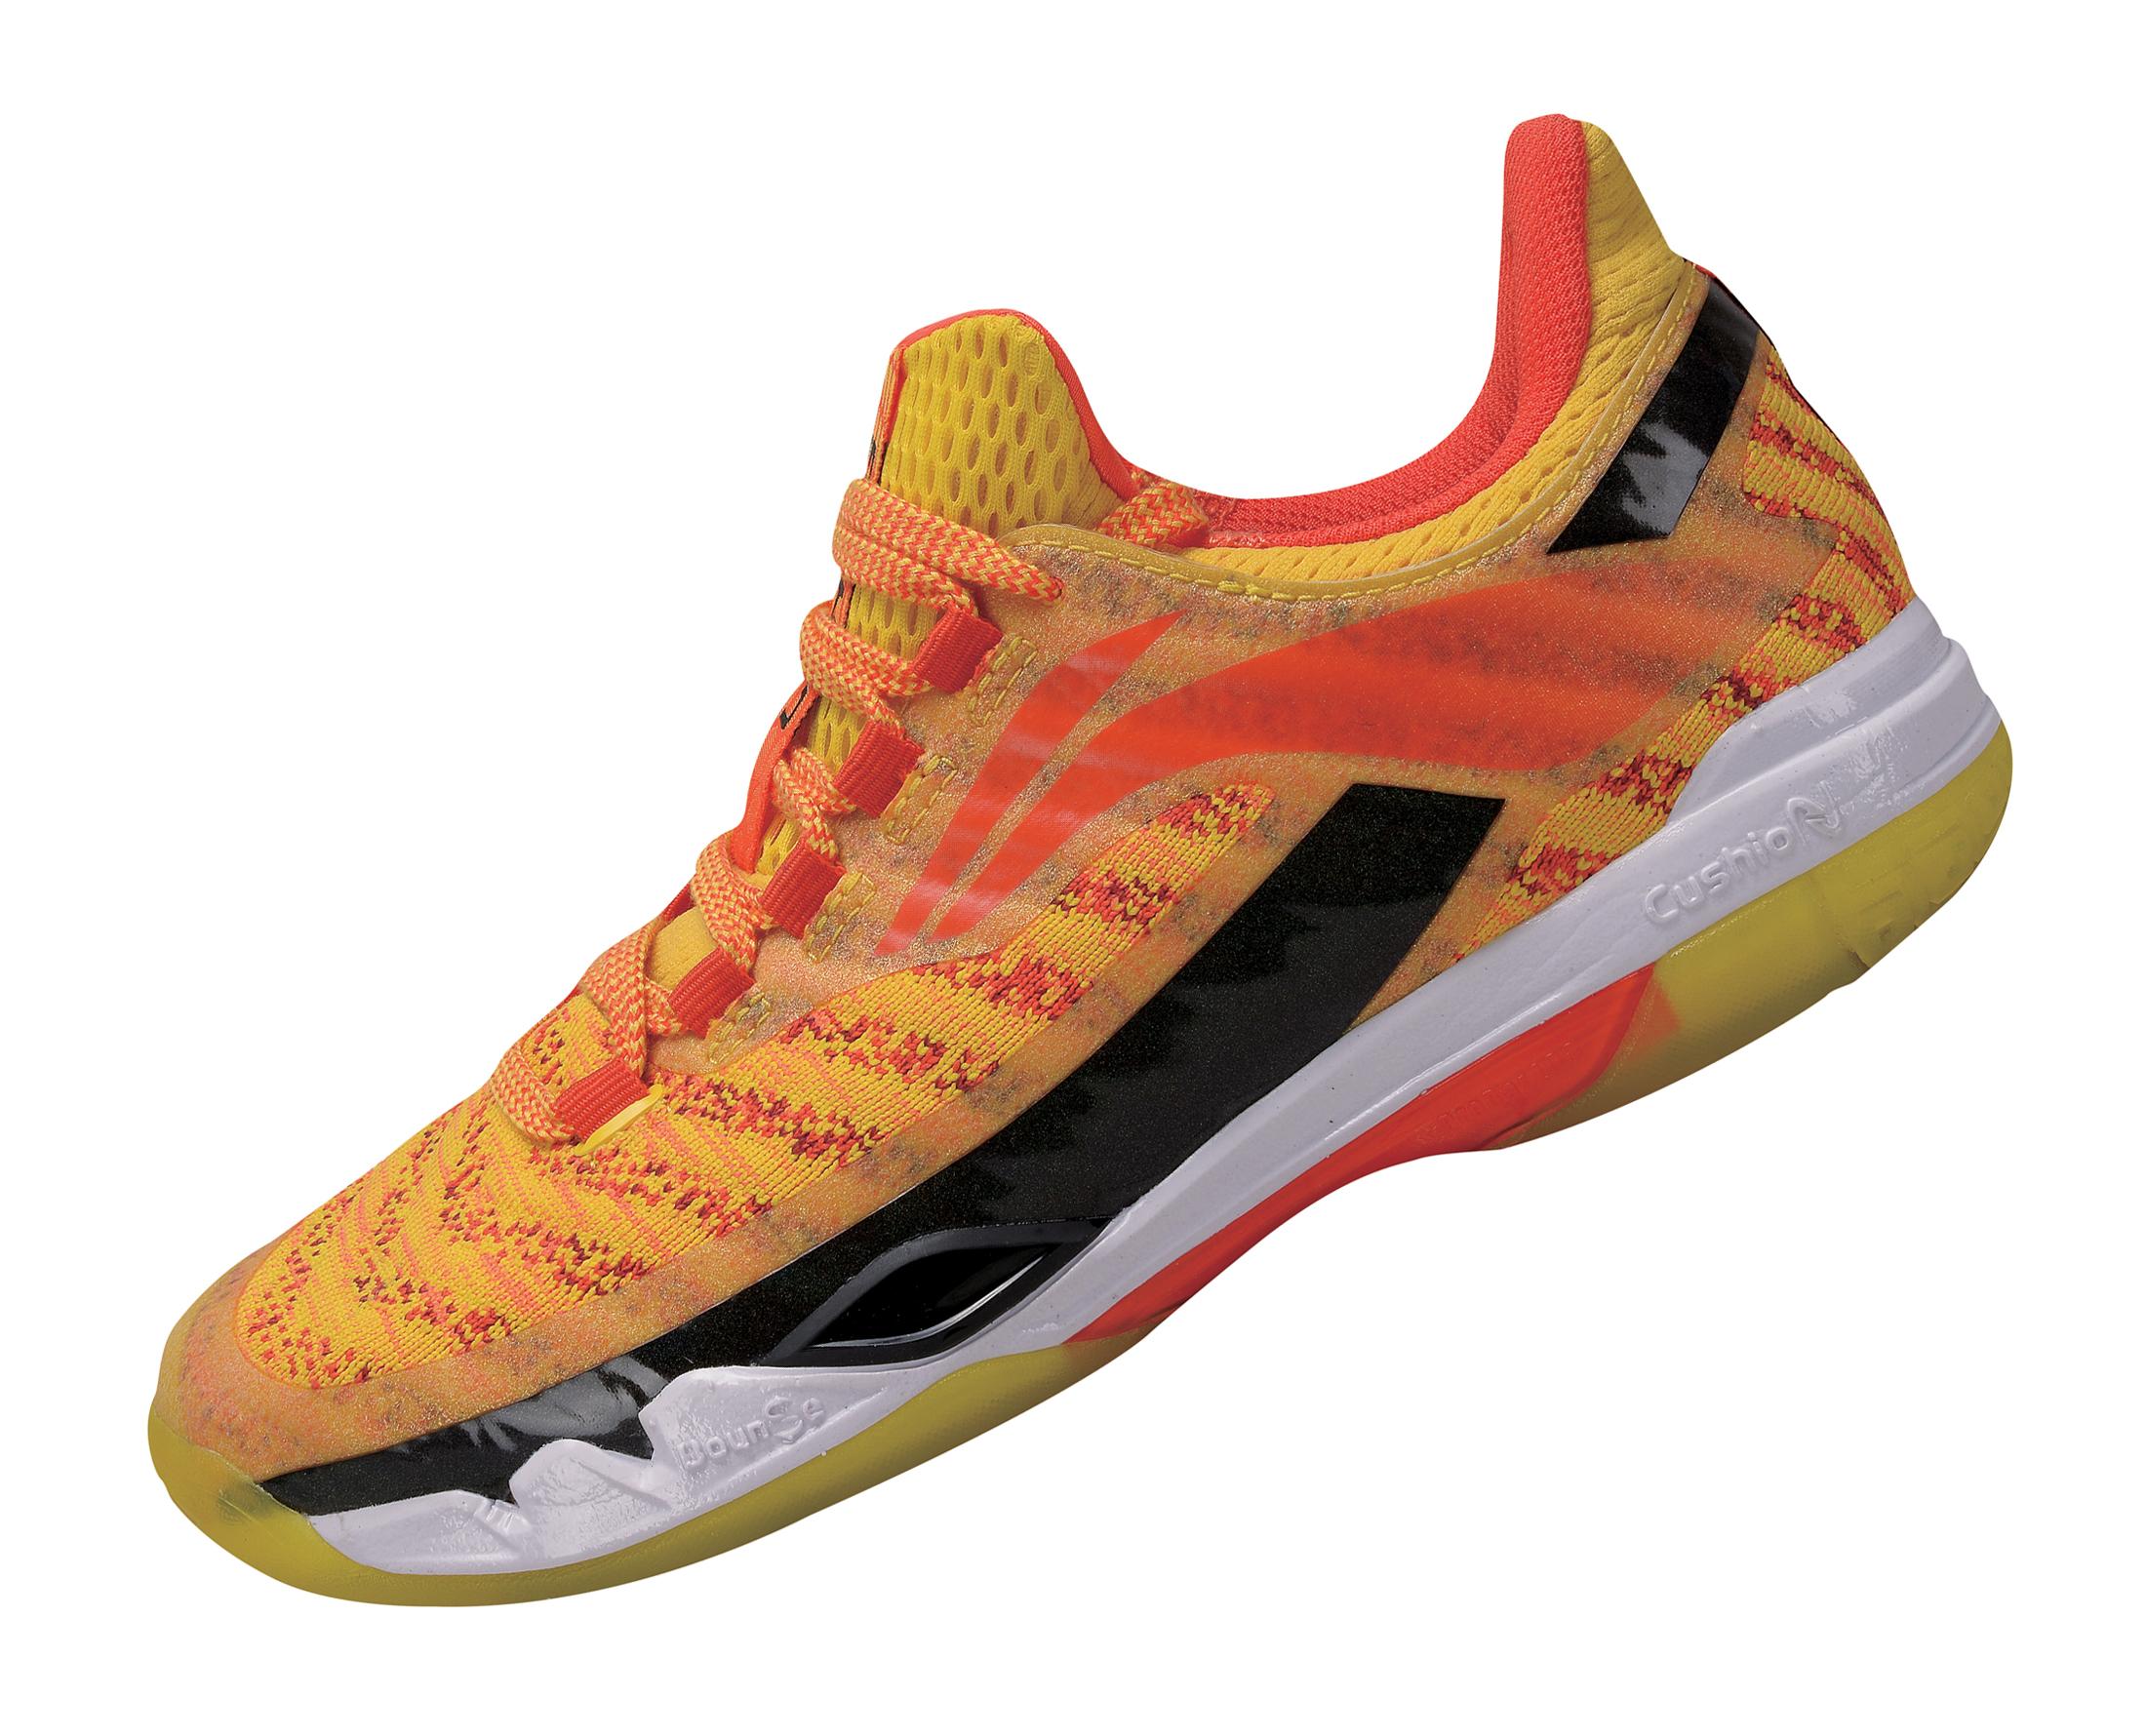 aliexpress cost charm running shoes Badminton Shoes - Women's [YELLOW], Li-Ning Badminton Superstore